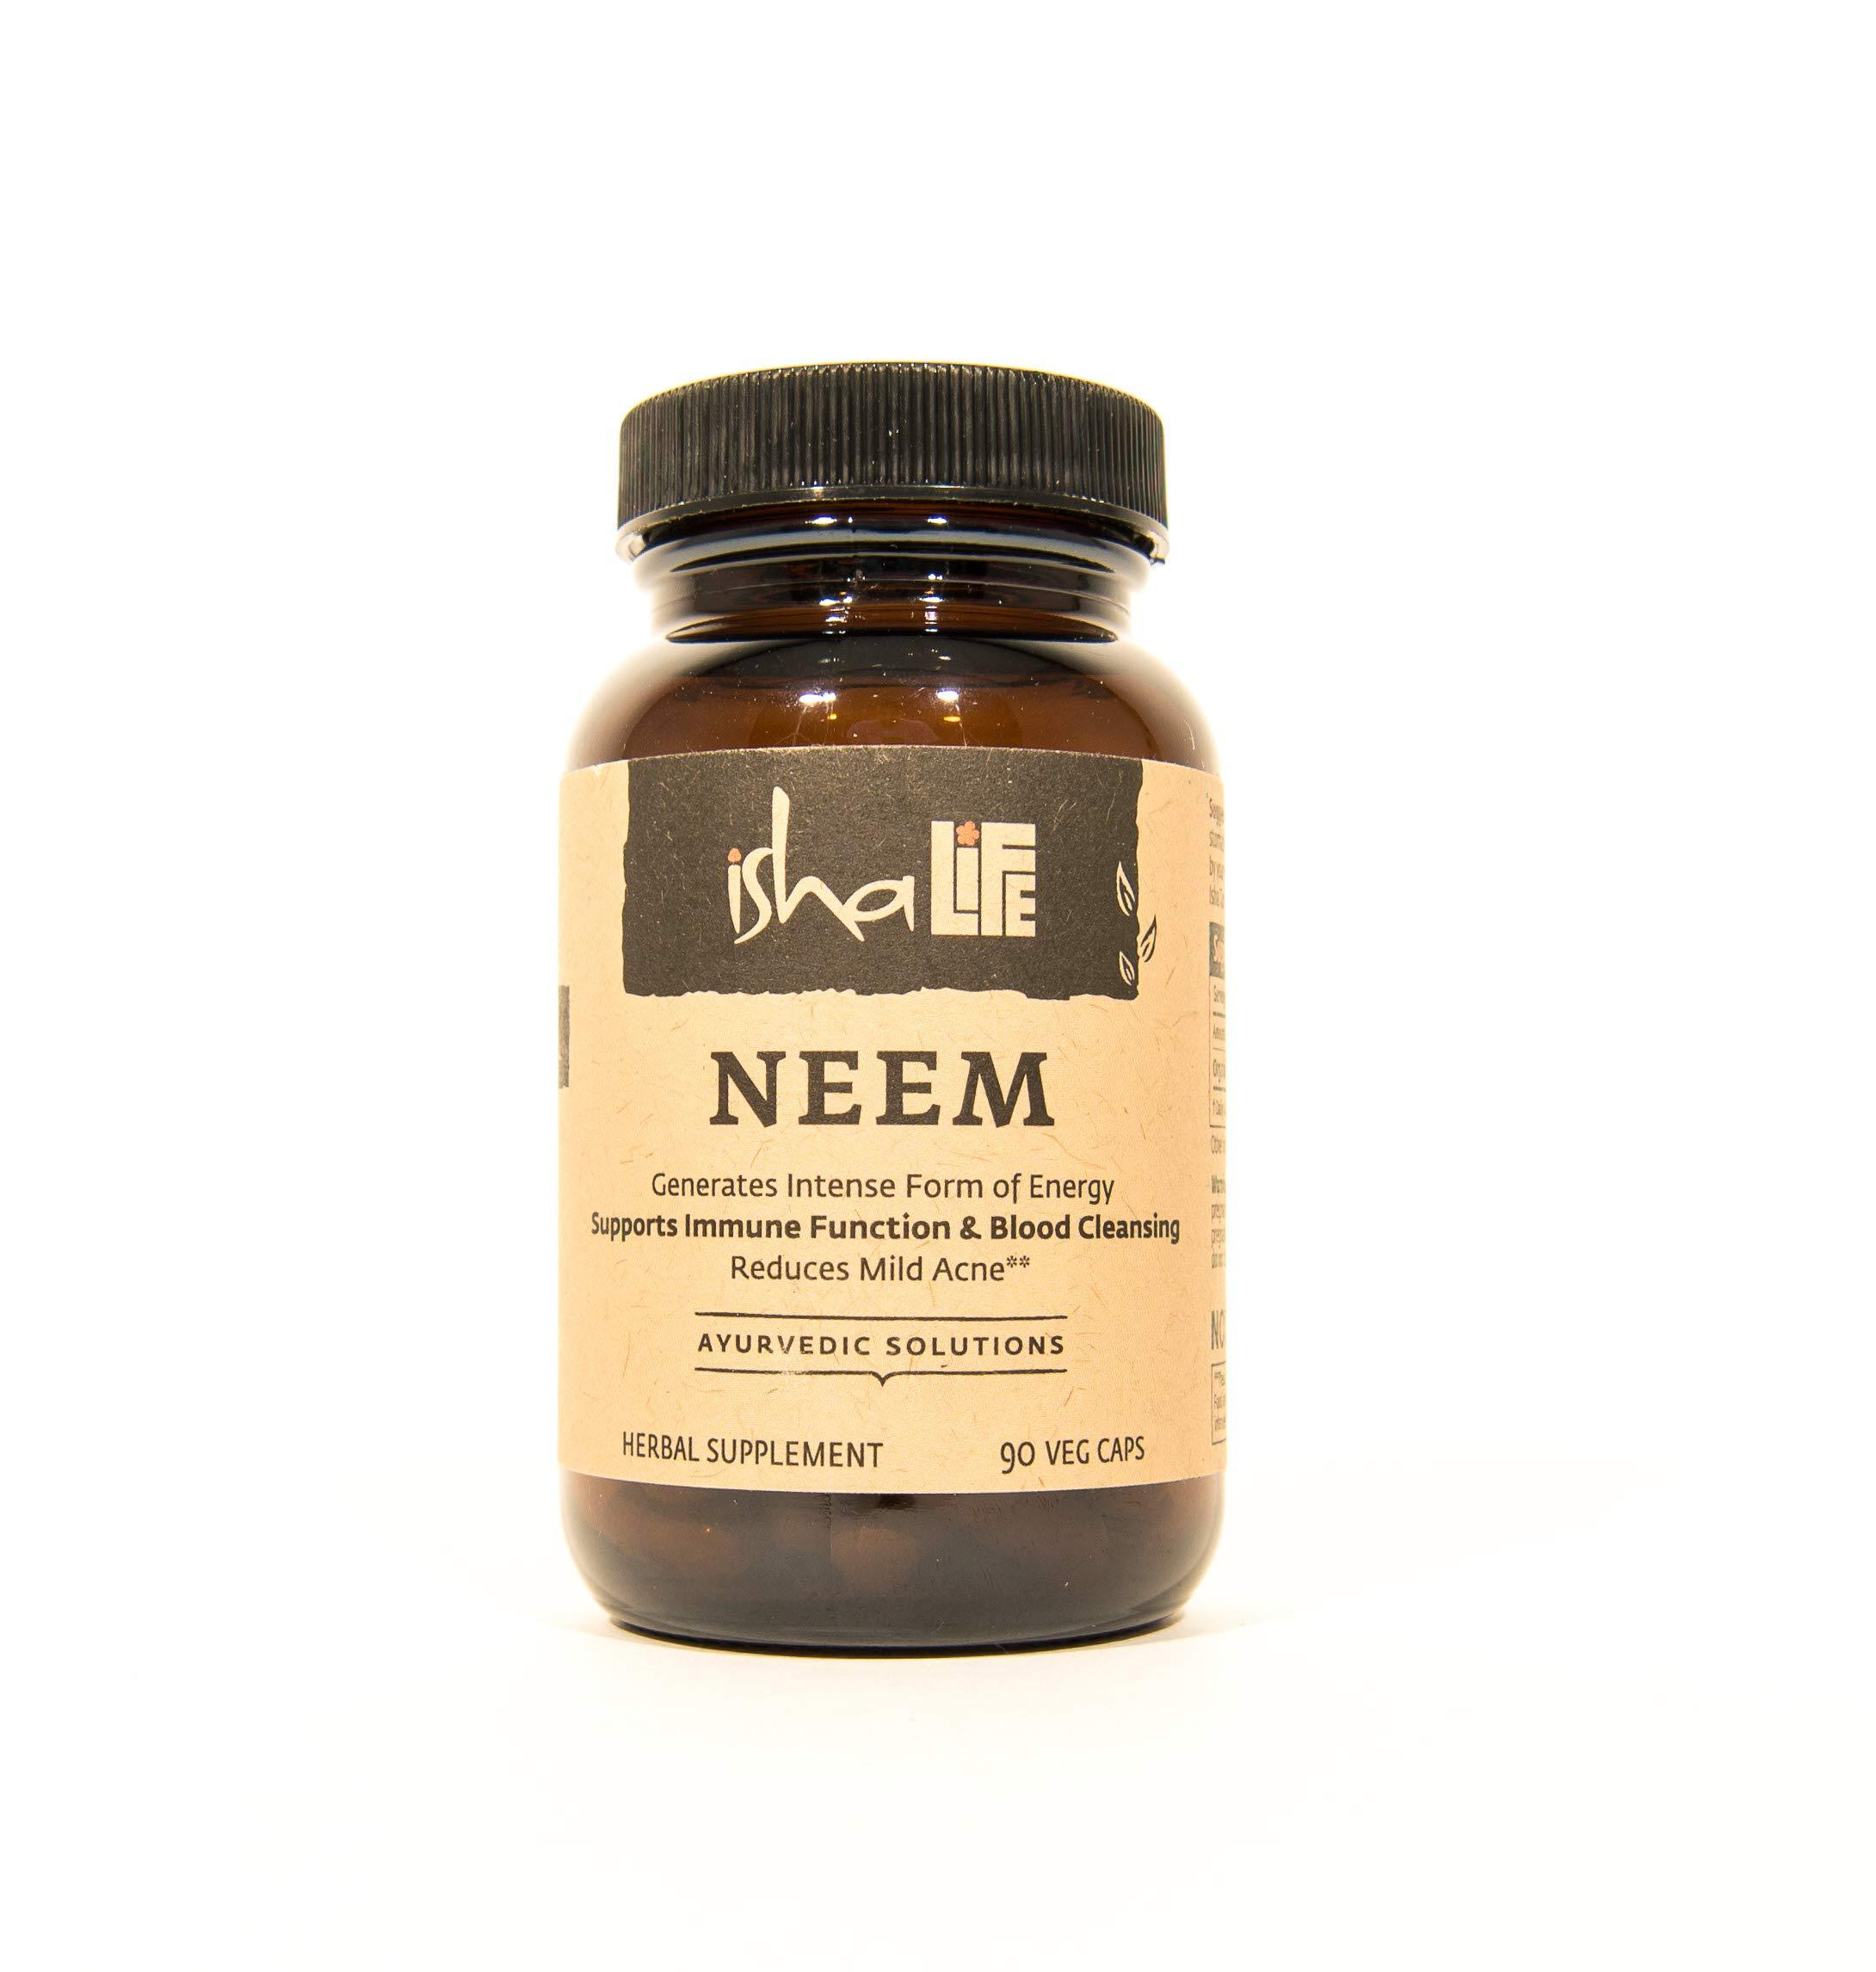 Isha Organic Neem Supplement — Natural Ayurvedic Herbal Cleanser and Purifier: Boosts Immunity - 90 Vegetarian Capsules, 950 mg Each